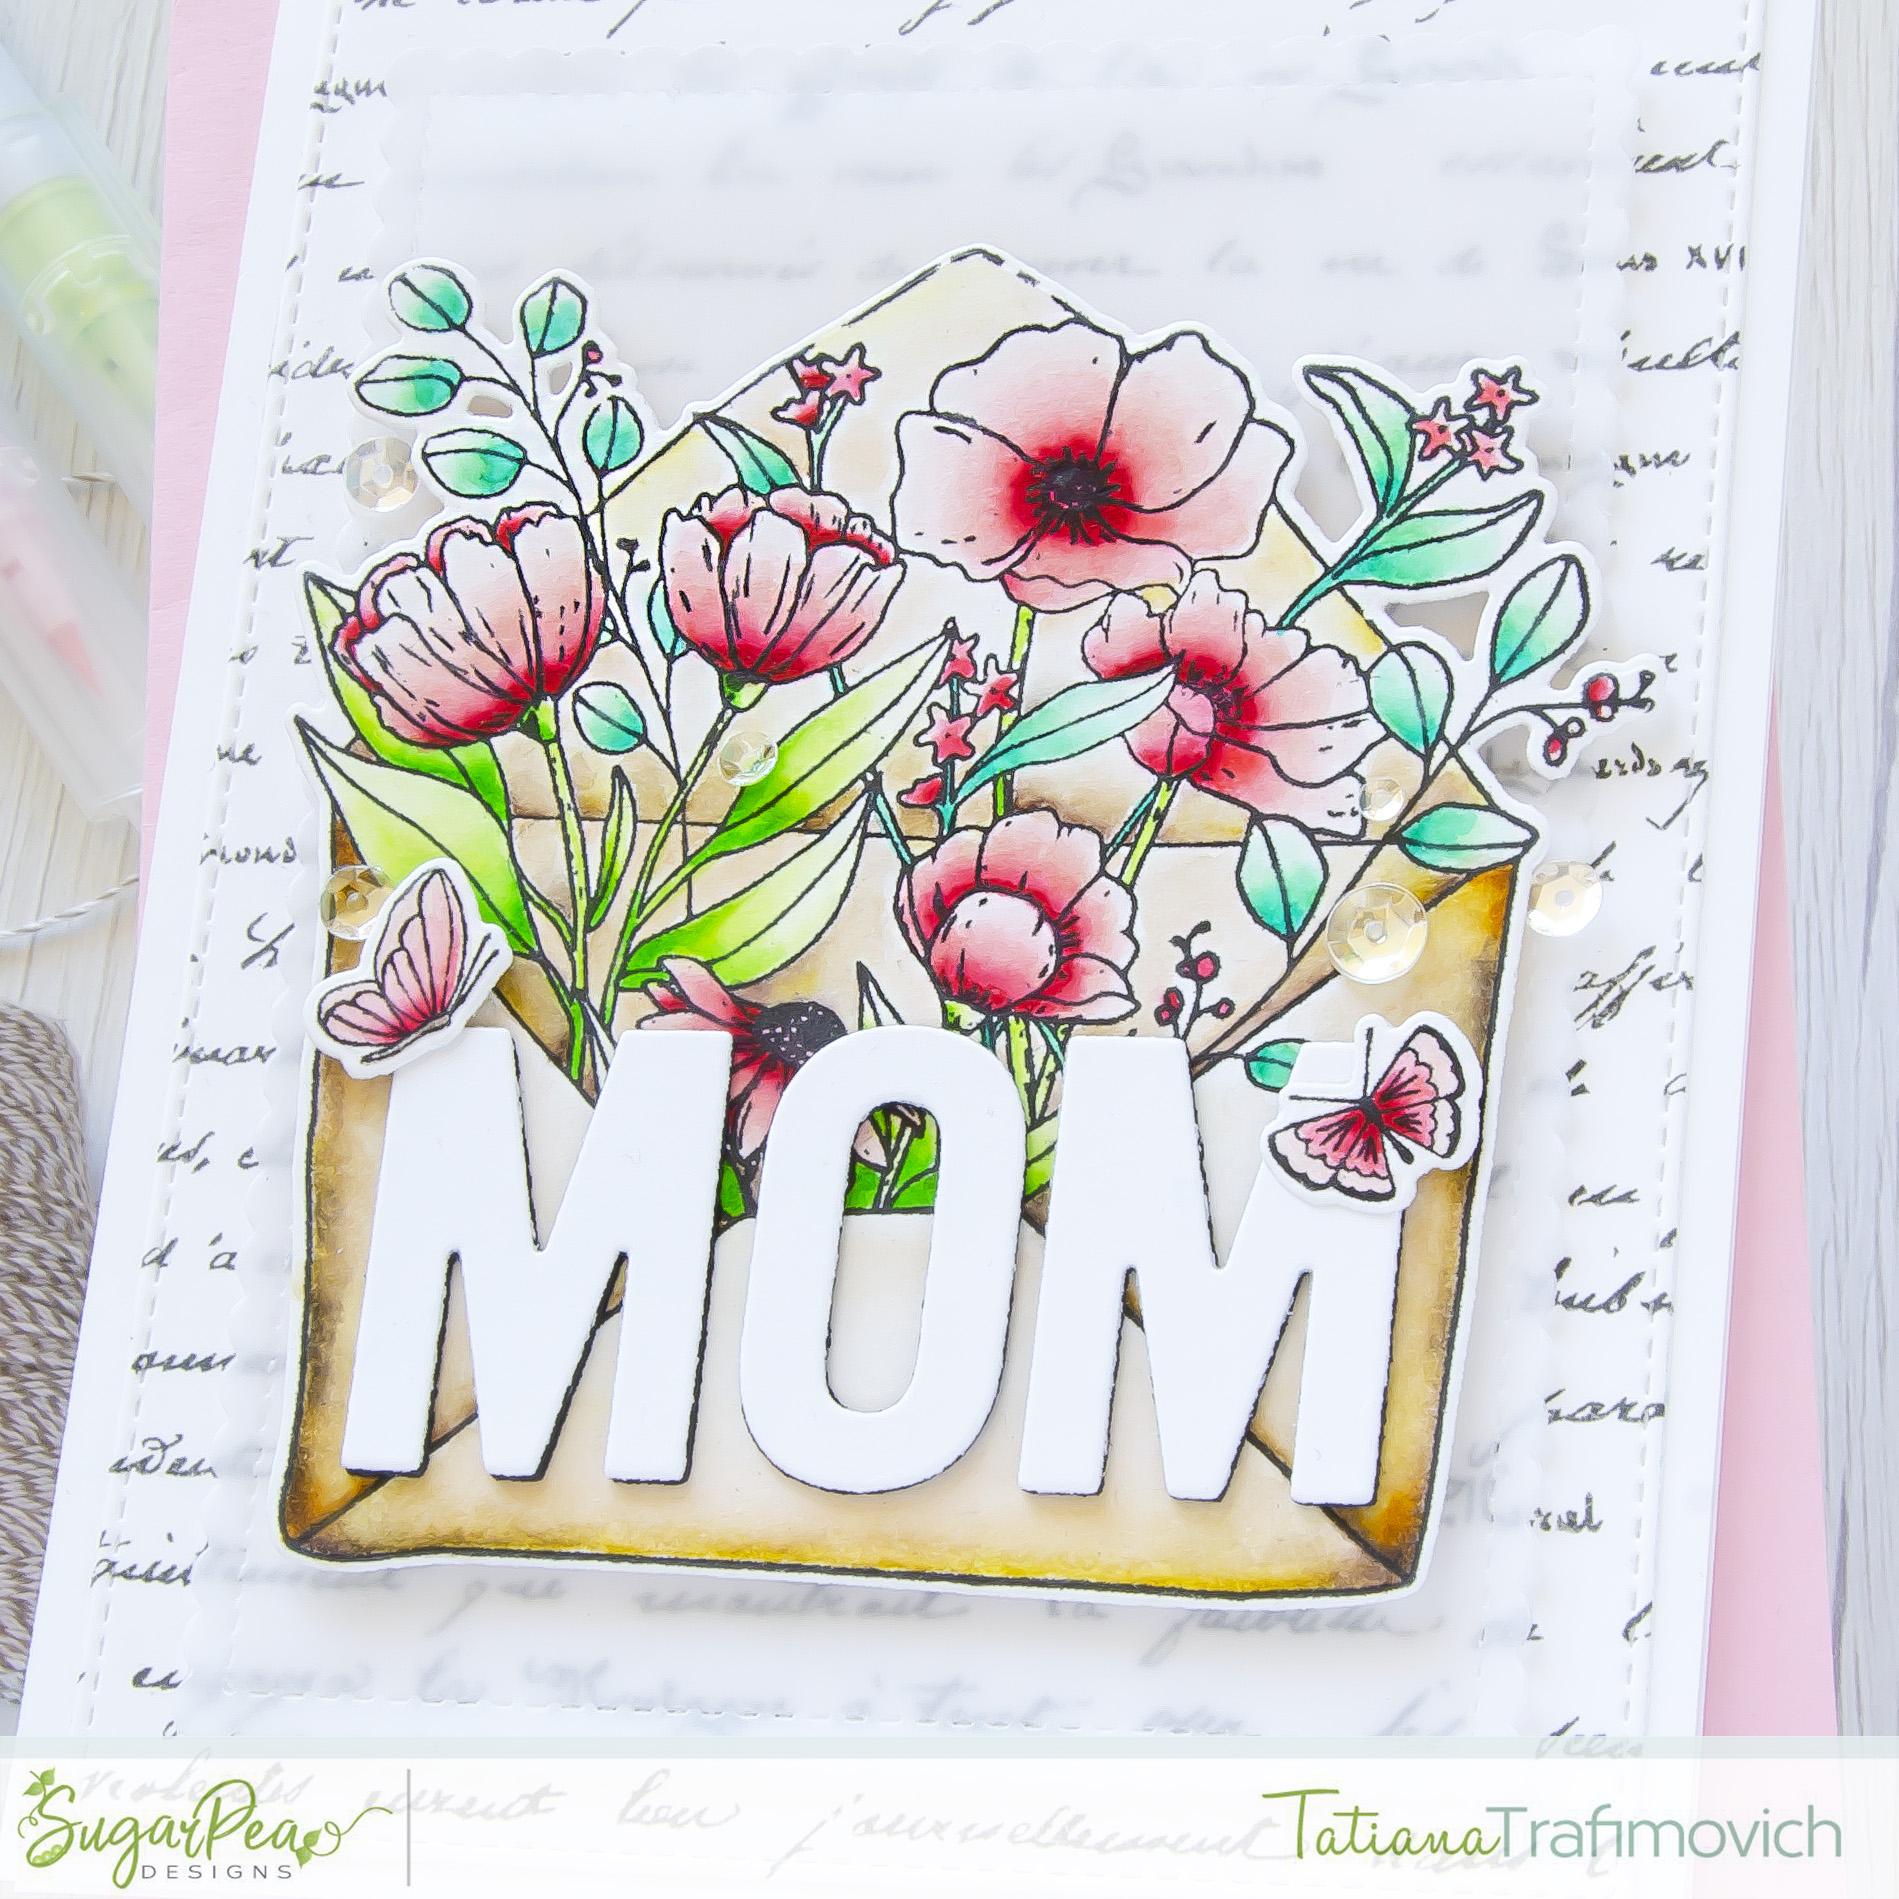 MOM #handmade card by Tatiana Trafimovich #tatianacraftandart - Floral Envie stamp set by SugarPea Designs #sugarpeadesigns